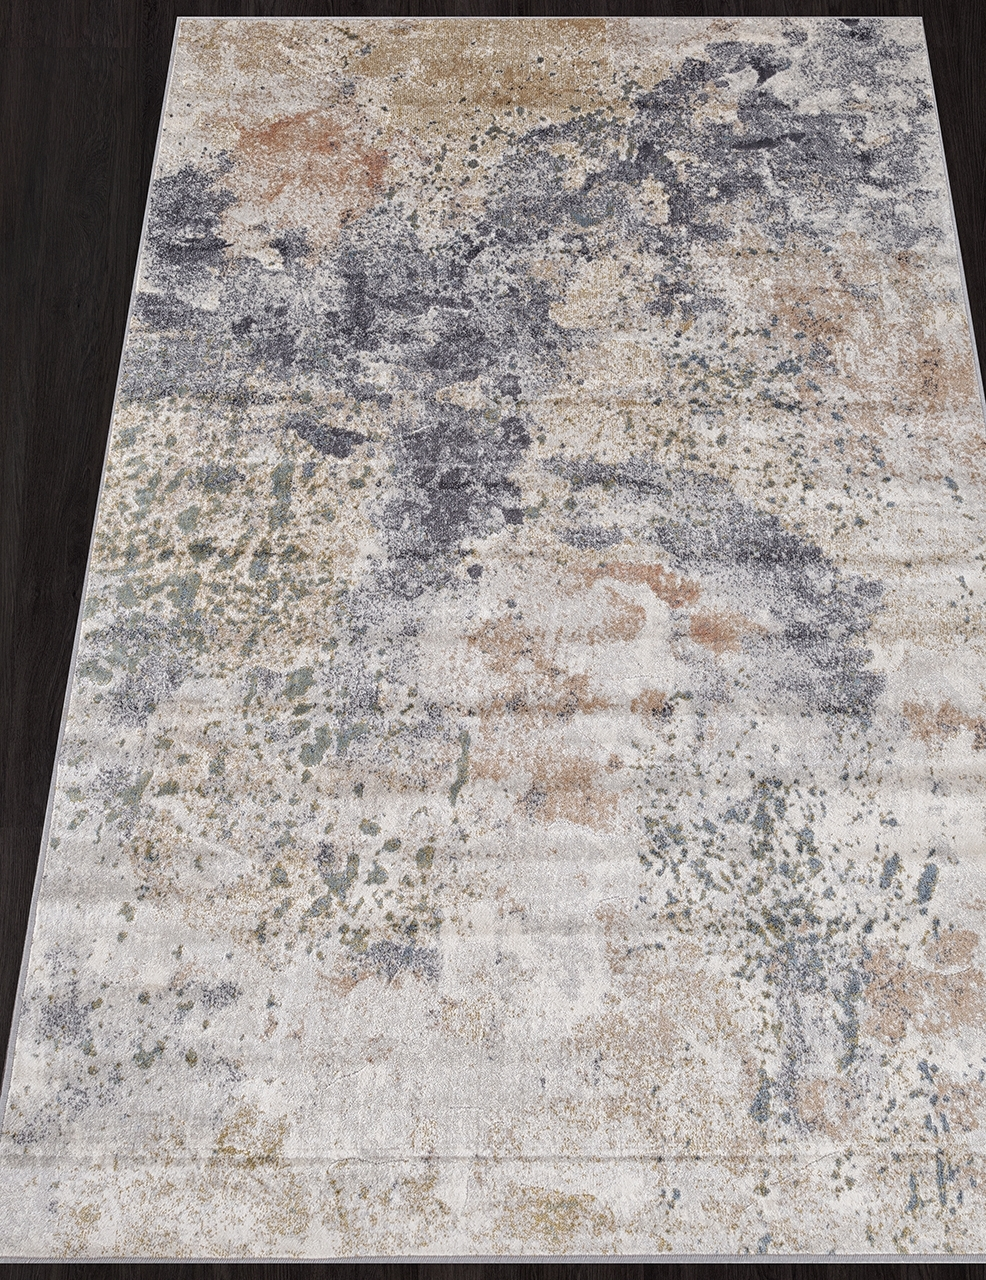 Ковер 985008 - 5151 - Прямоугольник - коллекция MAYUMI